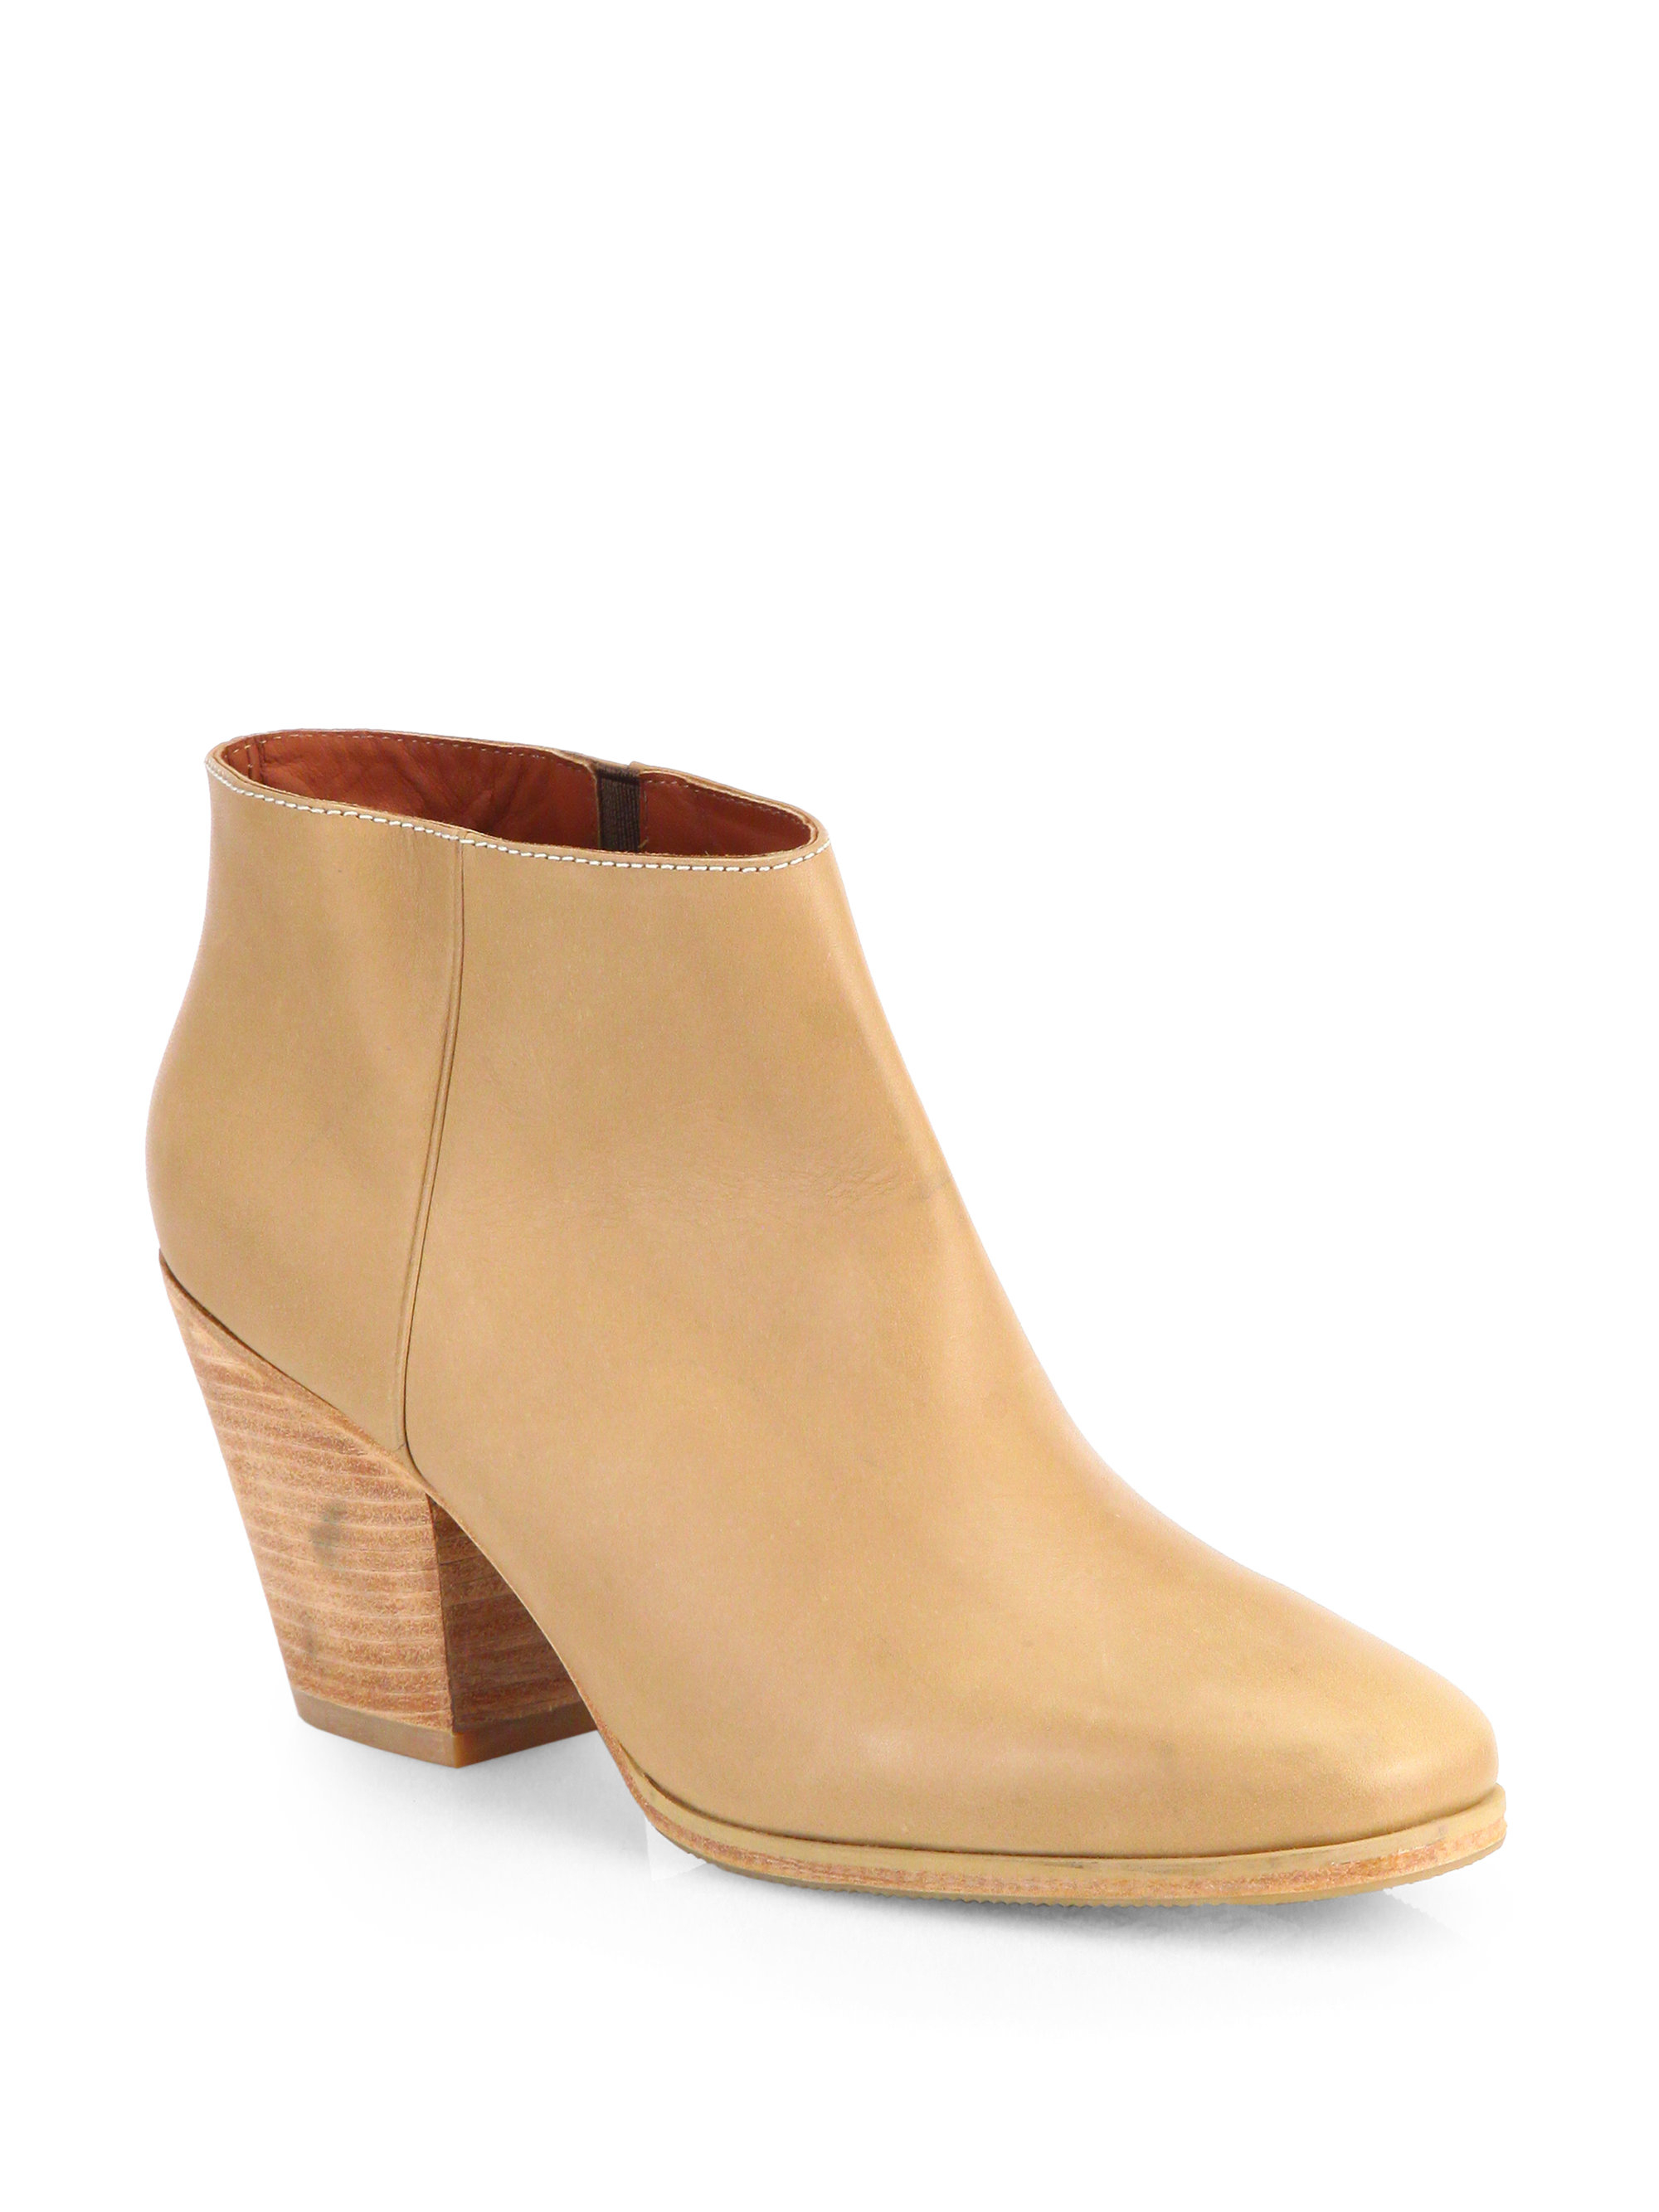 rachel comey mars leather ankle boots in beige camel lyst. Black Bedroom Furniture Sets. Home Design Ideas